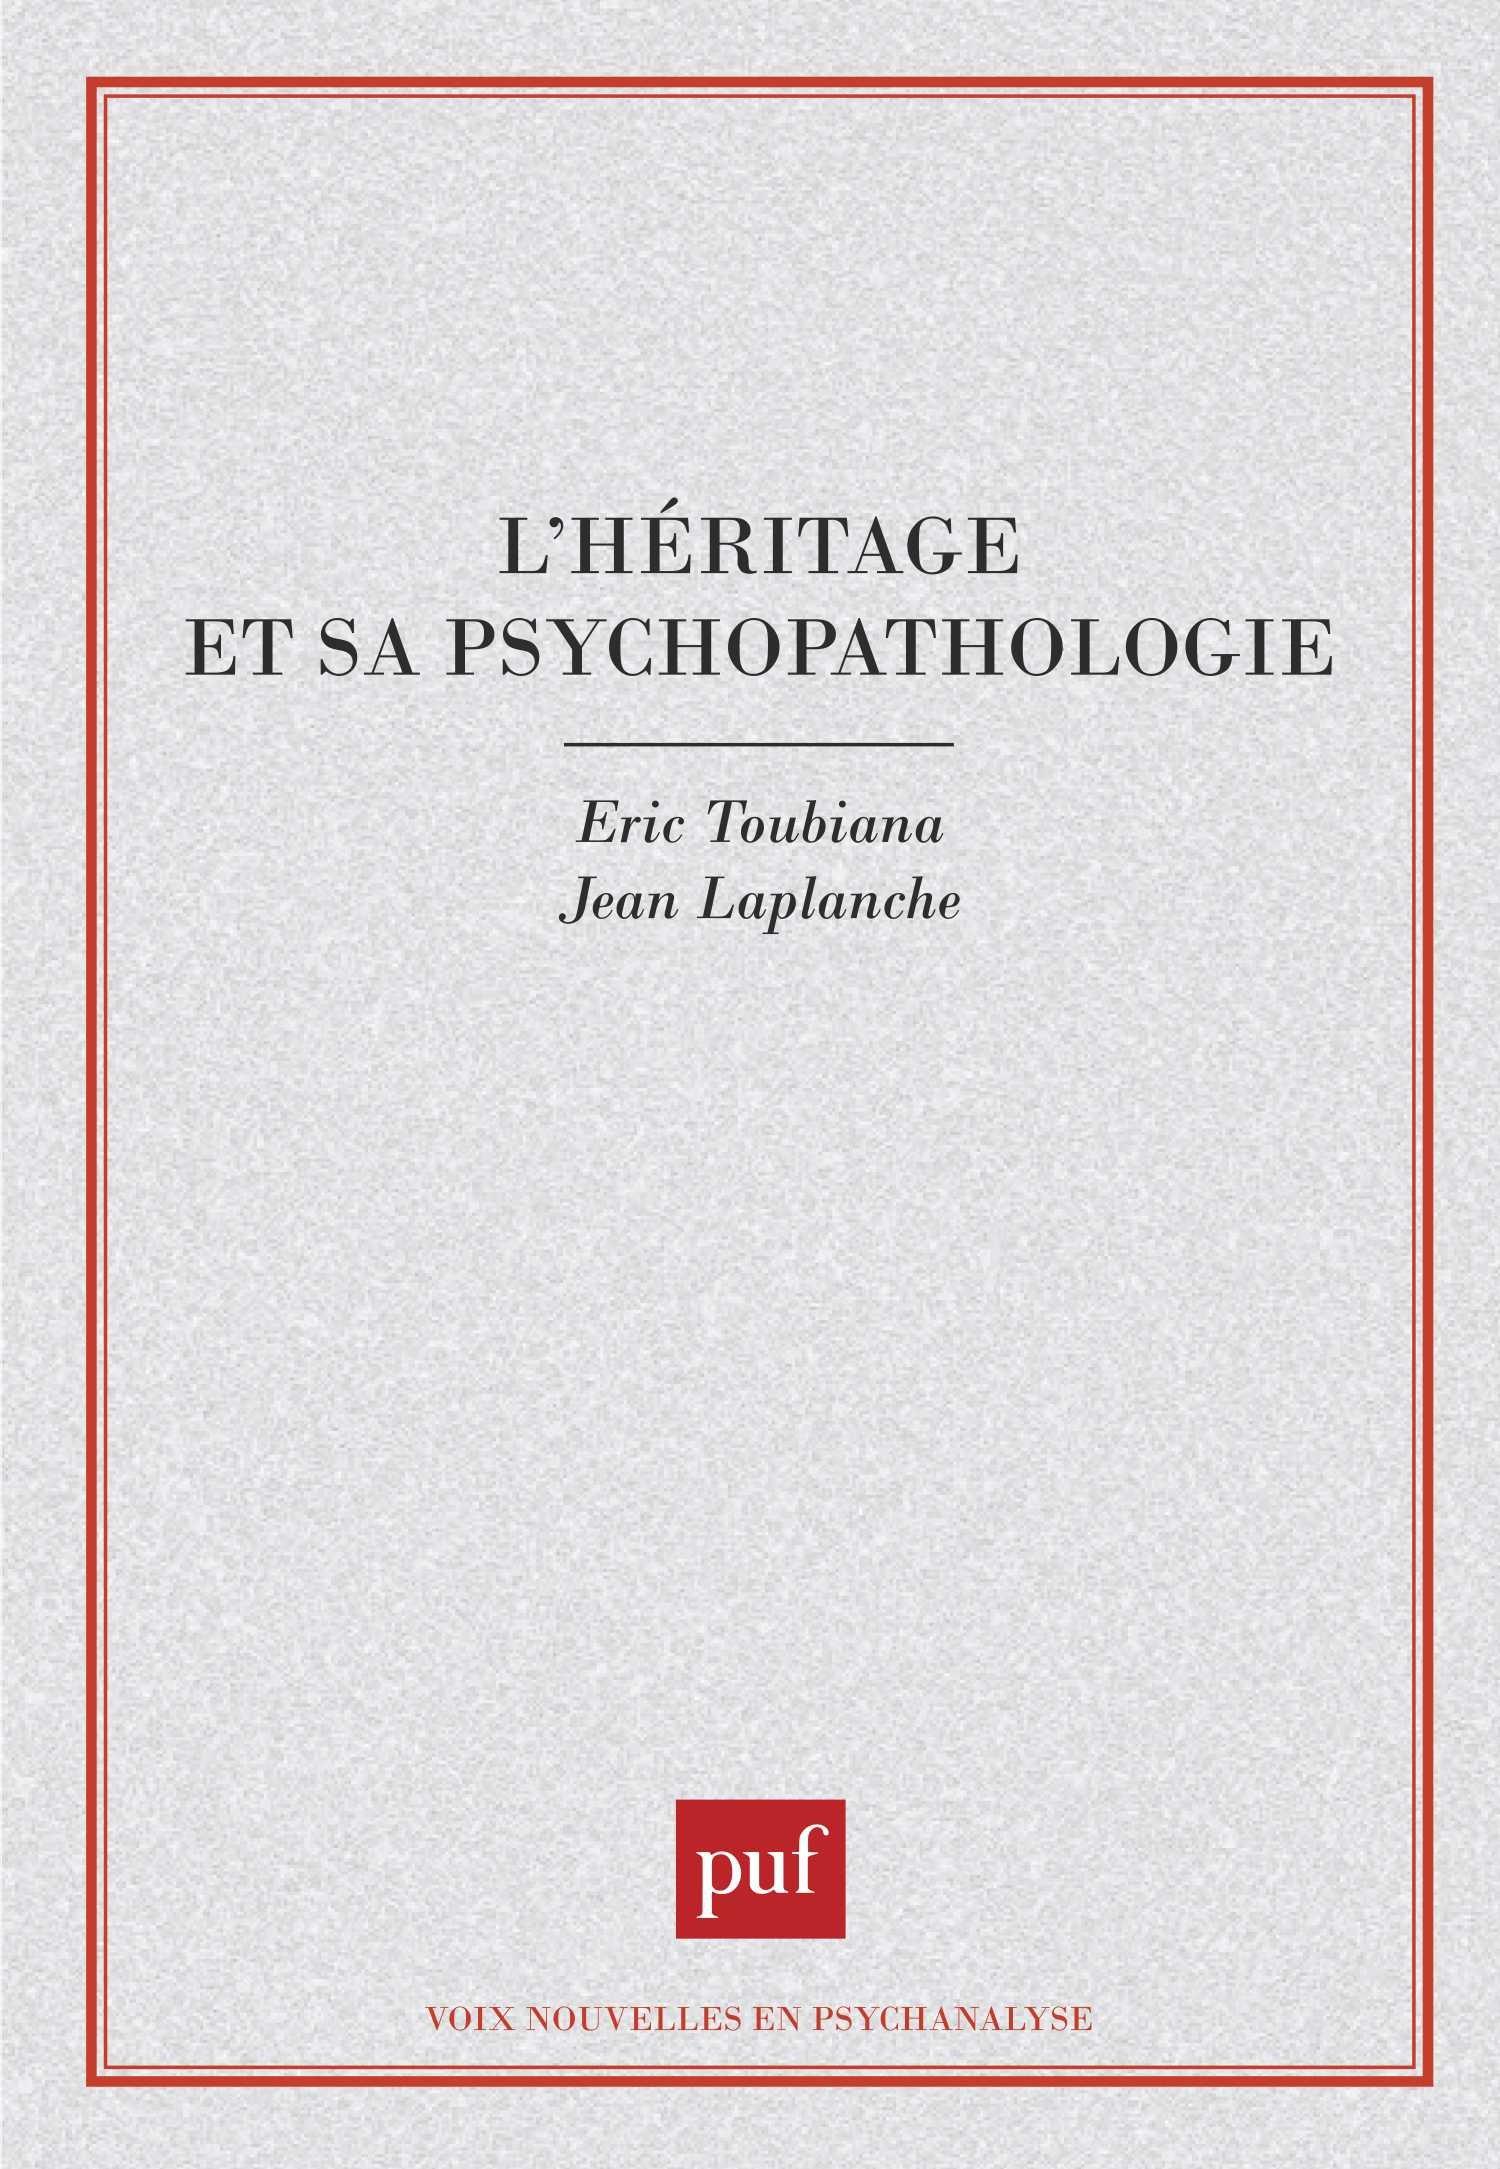 L'héritage et sa psychopathologie Broché – 1 juin 1988 Éric Toubiana Jean Laplanche 2130417620 Psychanalyse